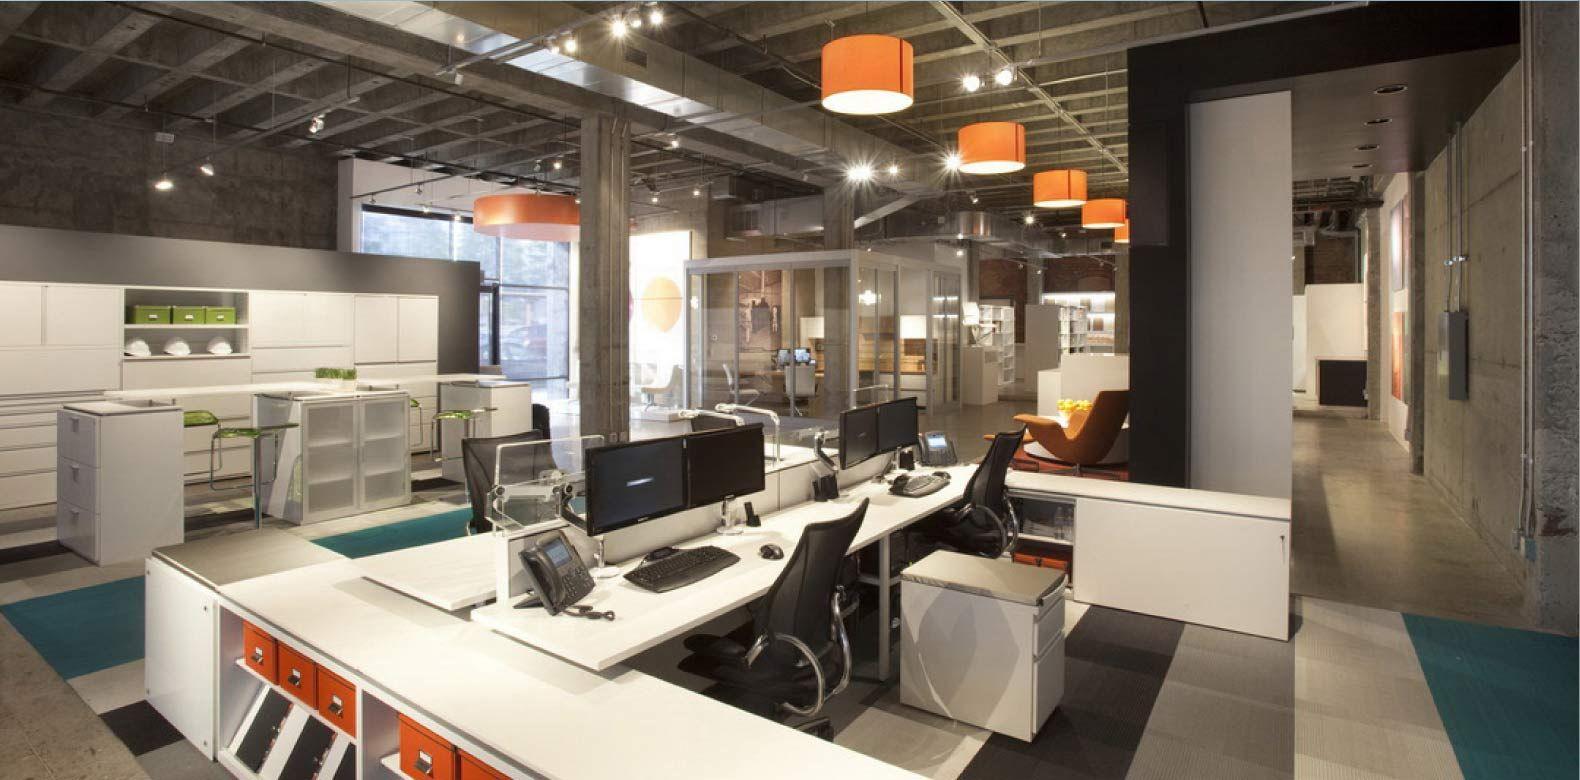 officespace.jpg 1,580×780 pixels